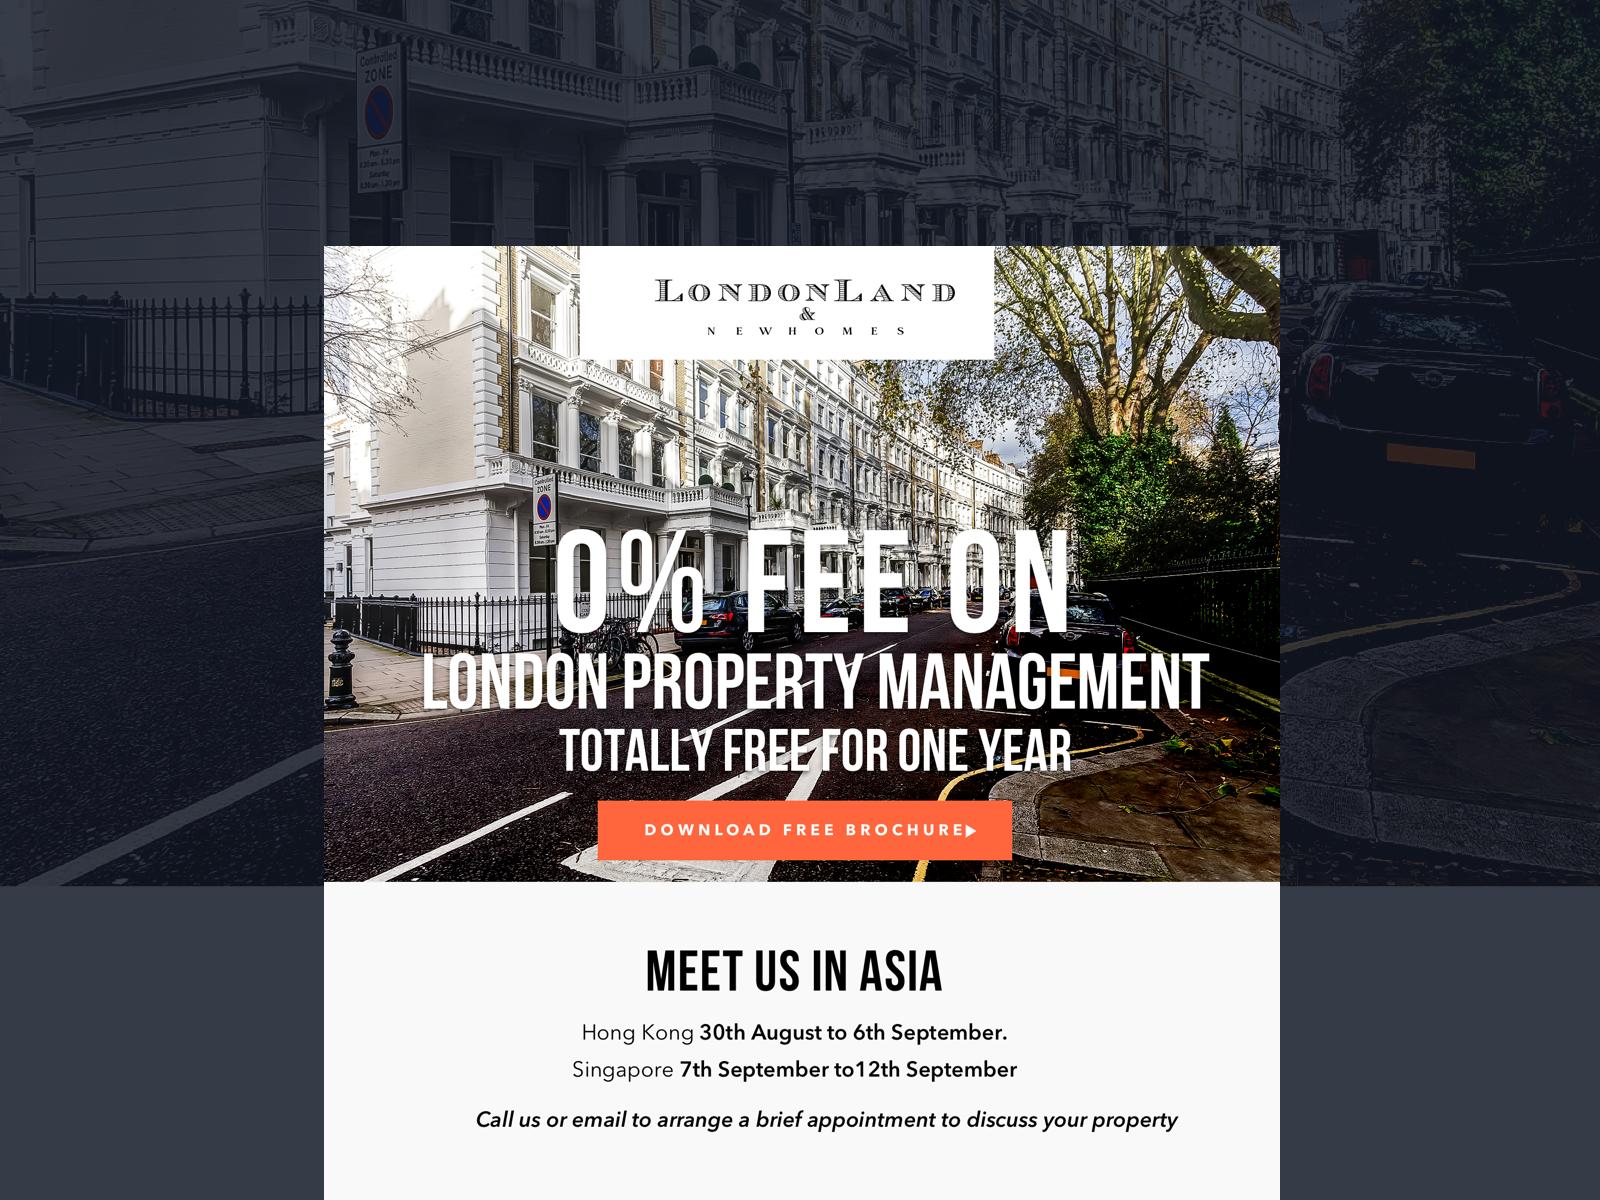 Email Template email ui fonts london image design brand identity email letter newsletter design newsletter